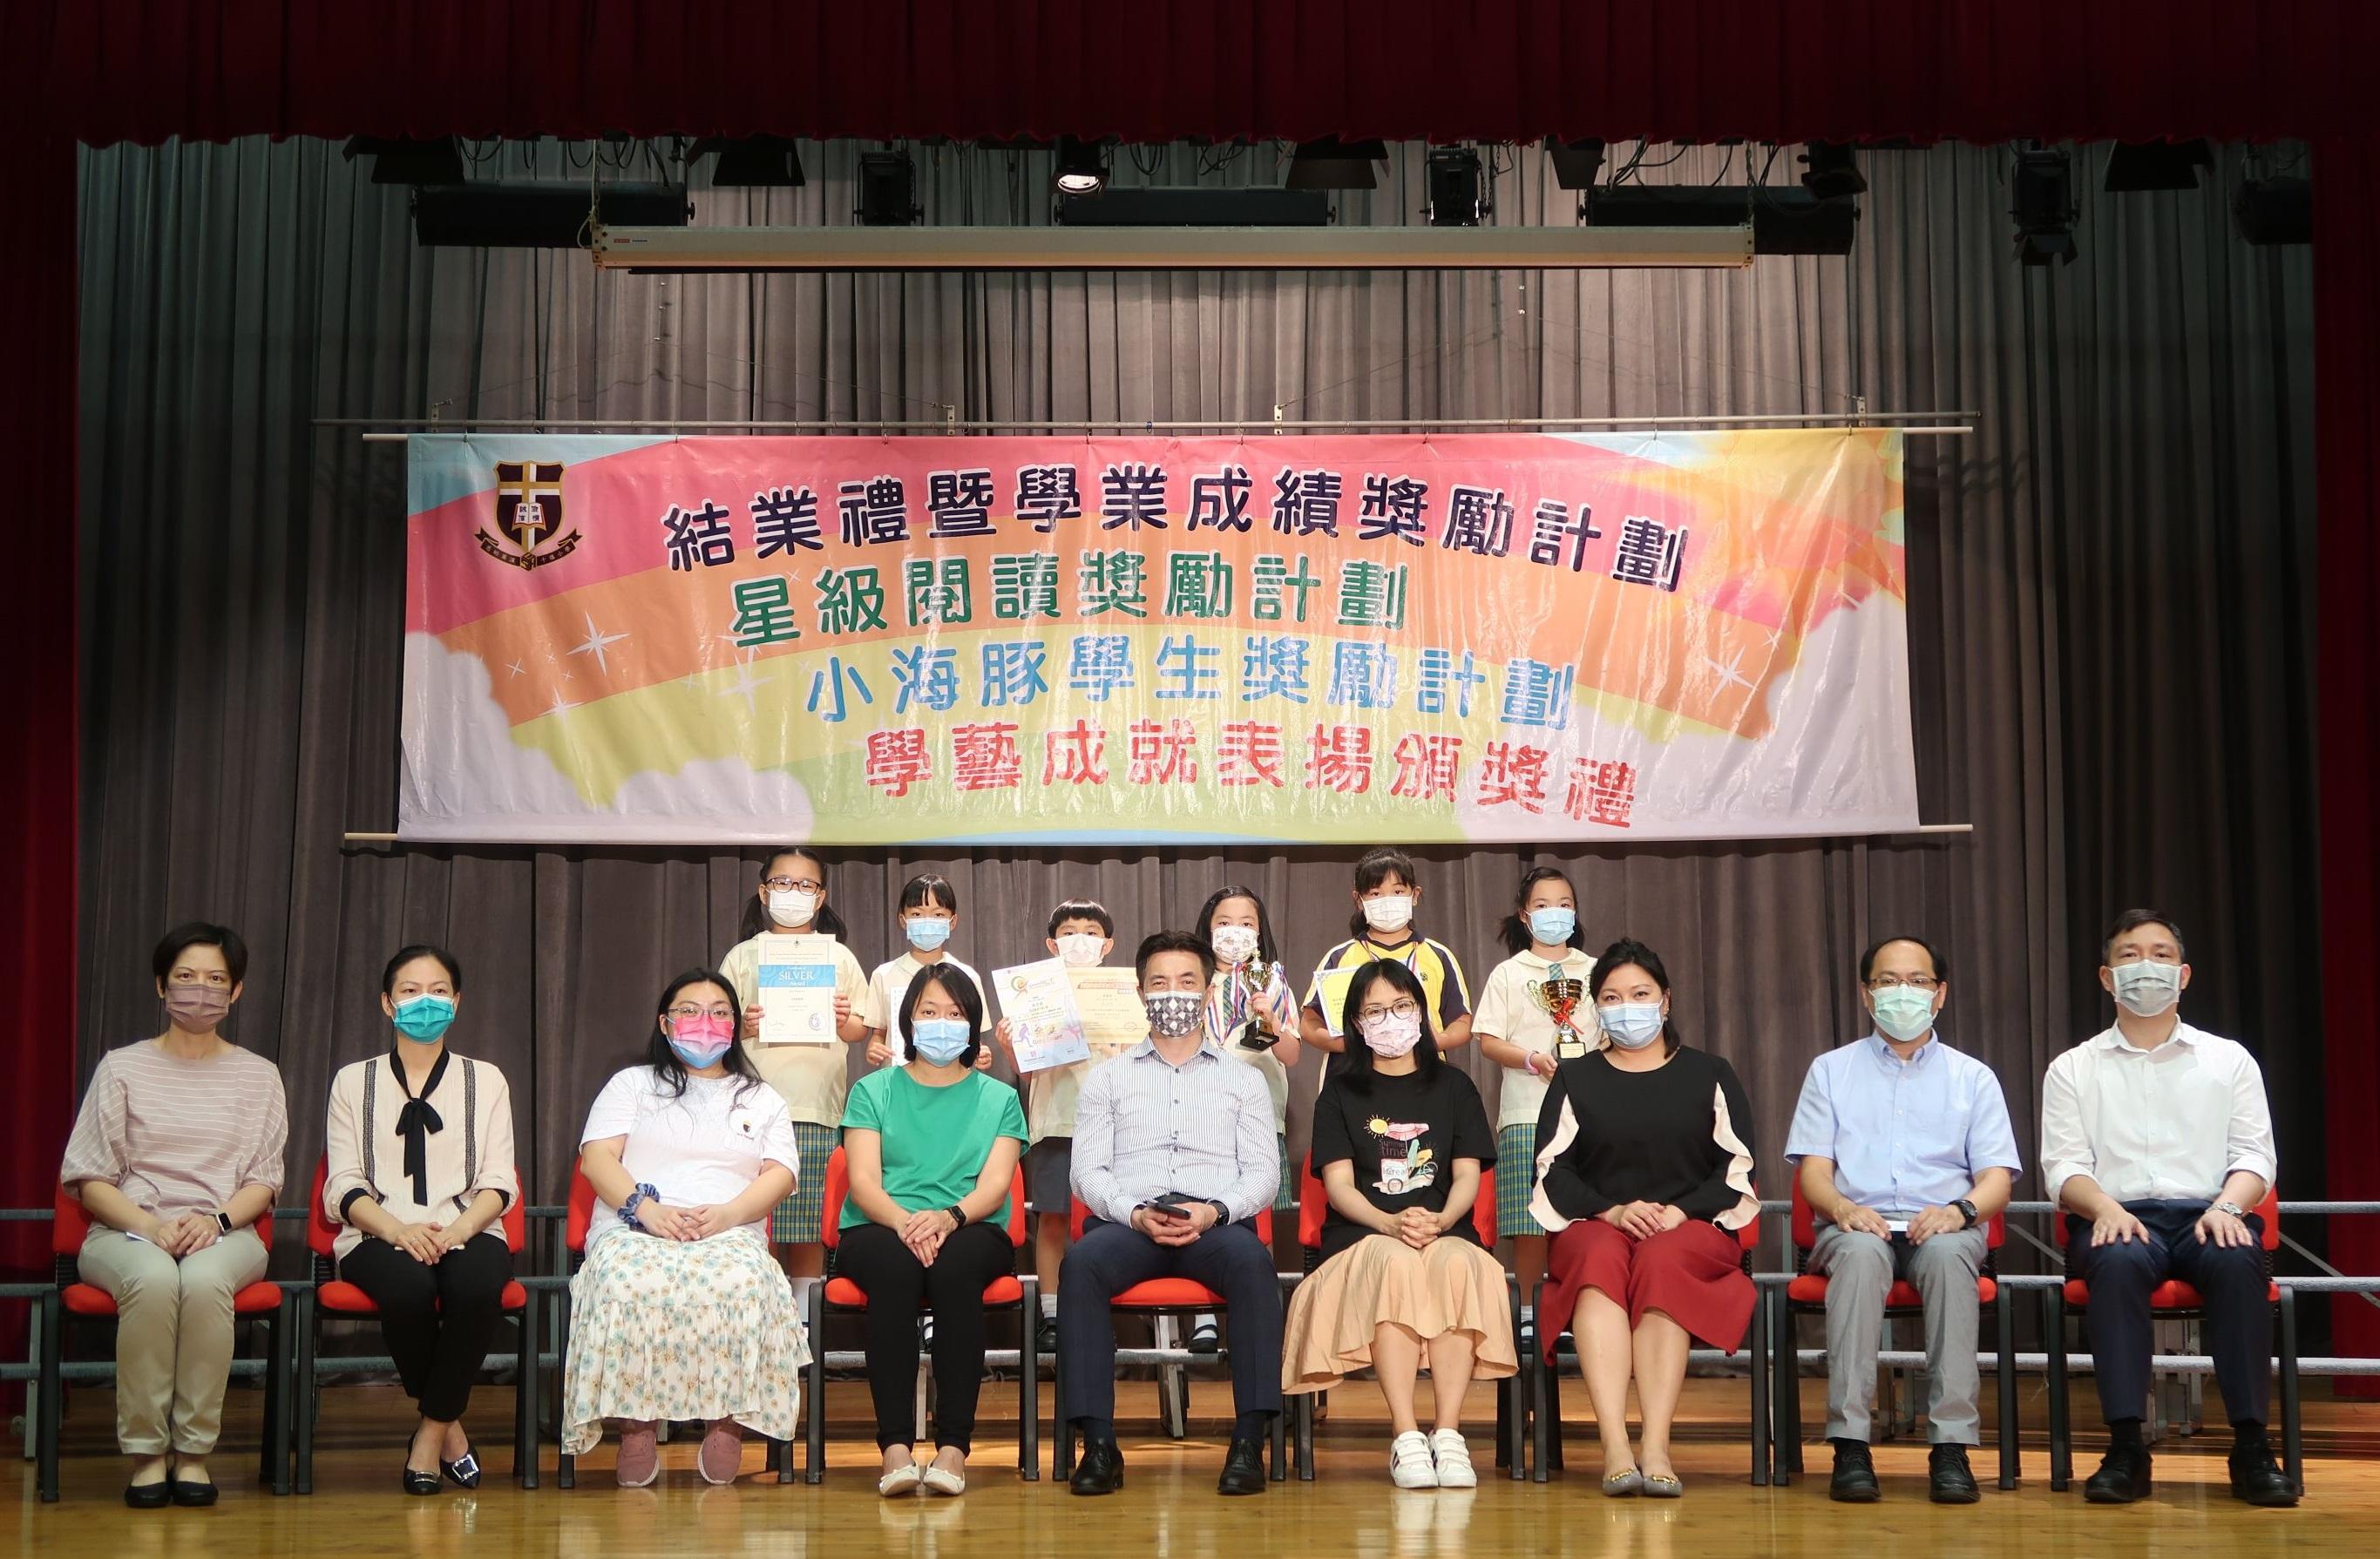 https://syh.edu.hk/sites/default/files/img_5926.jpg